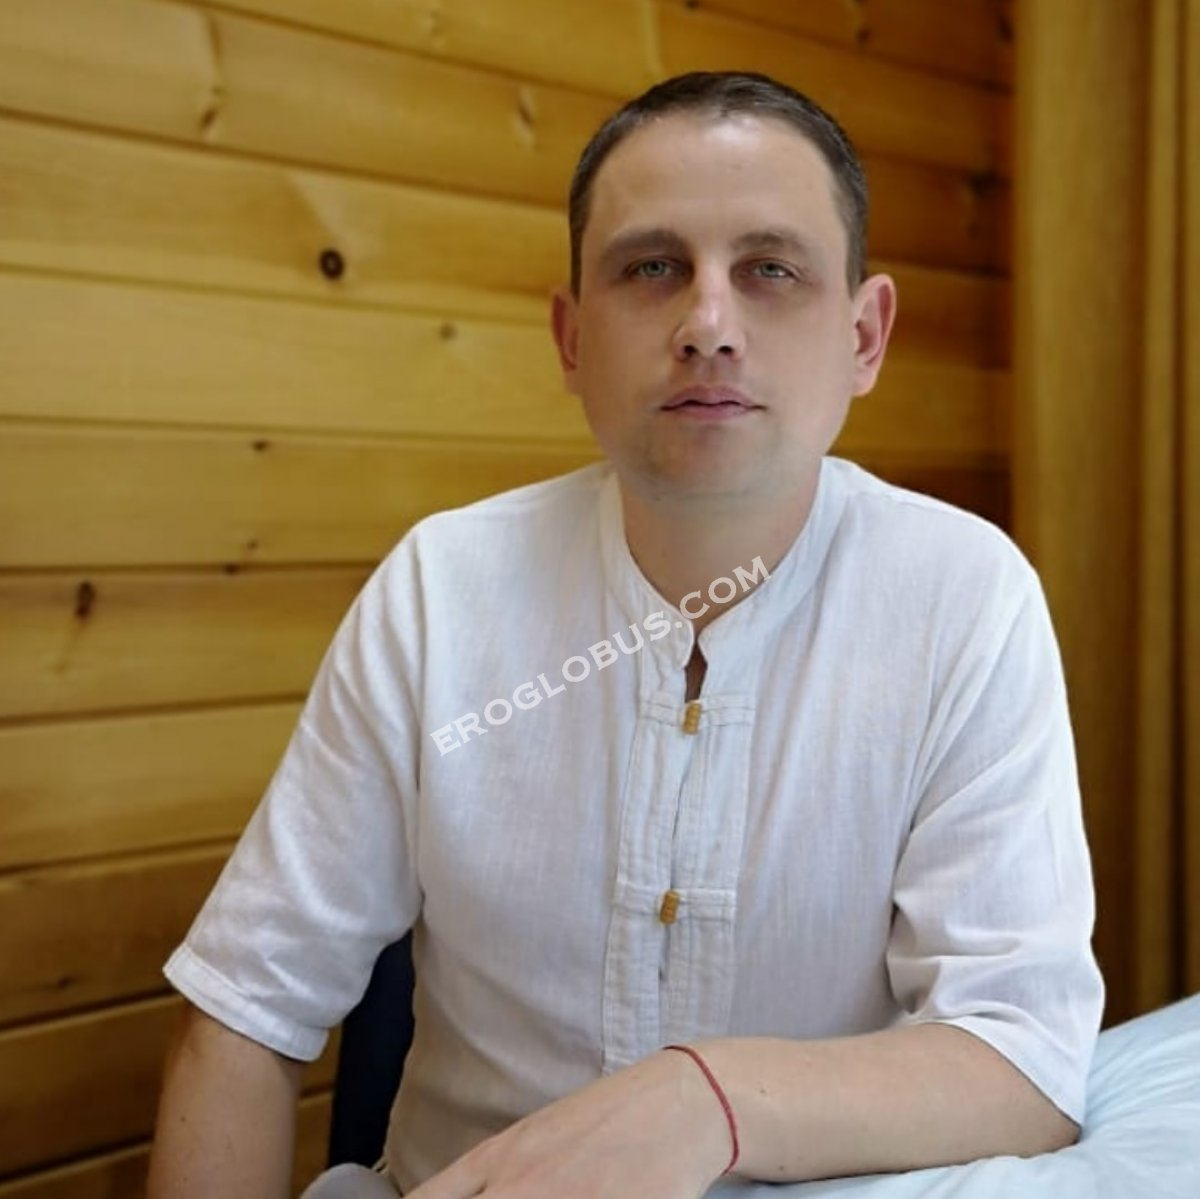 Павел Столбырин, 35